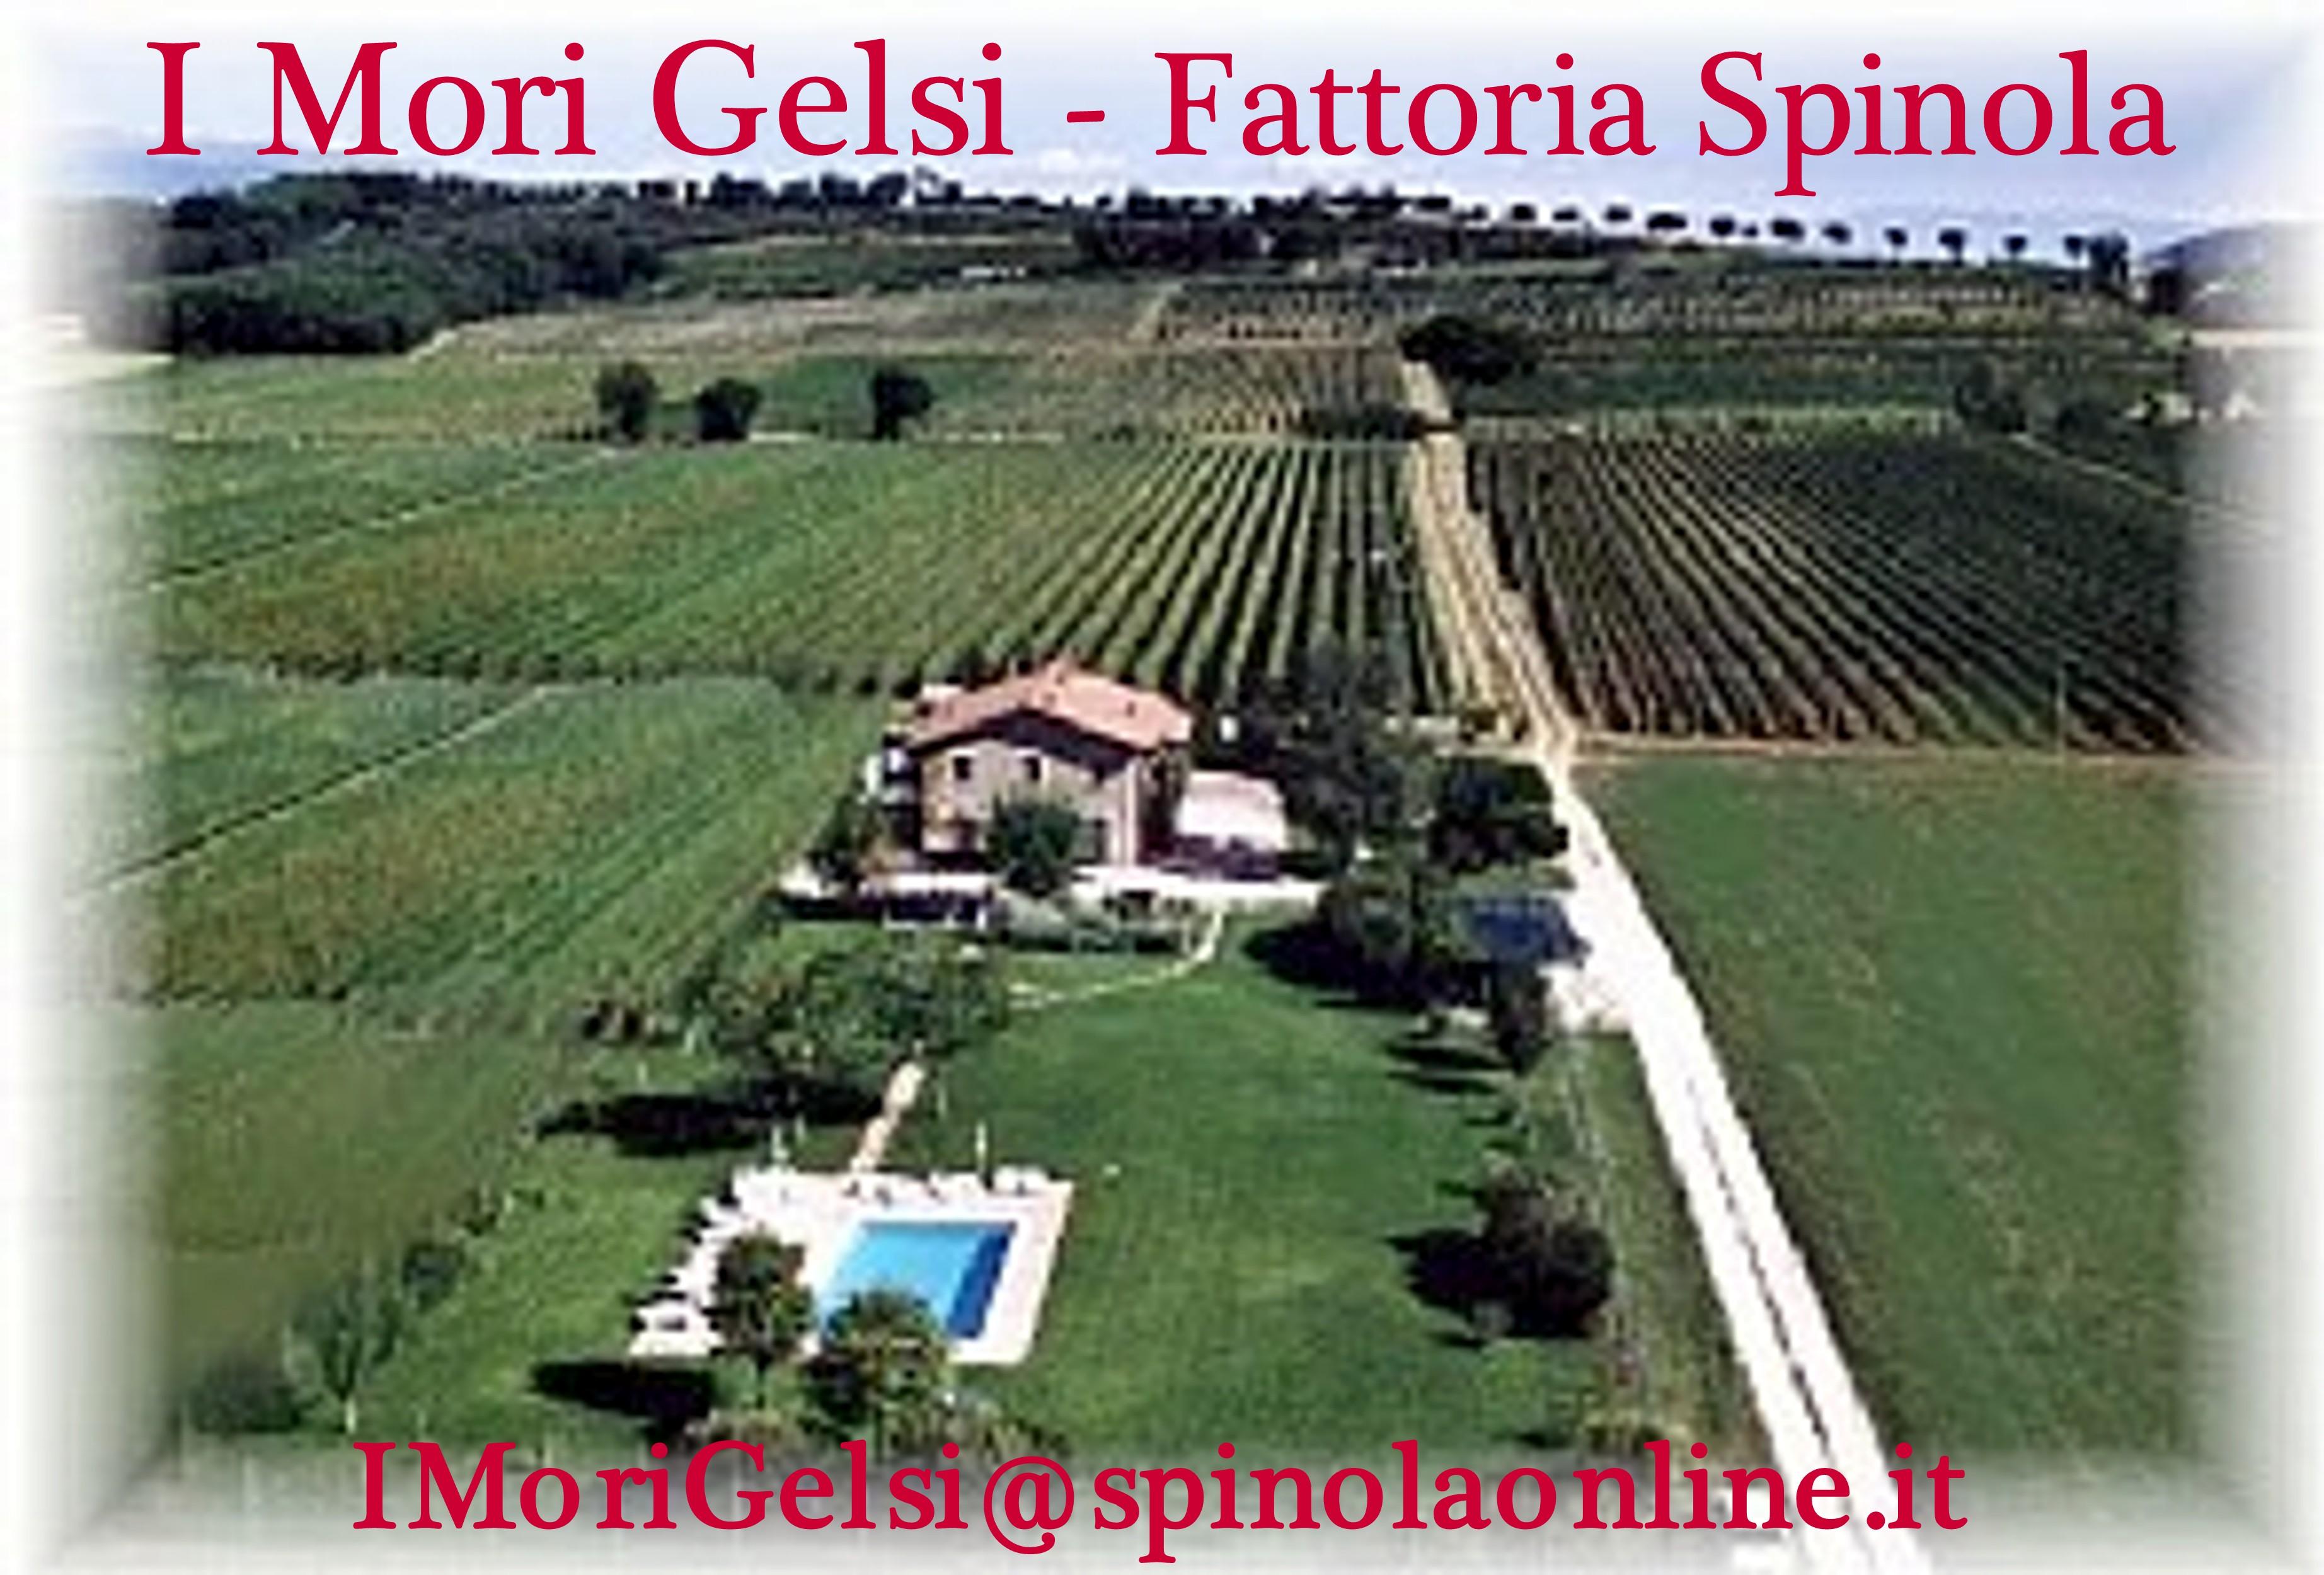 Agriturismo I MORI GELSI - Fattoria Spinola